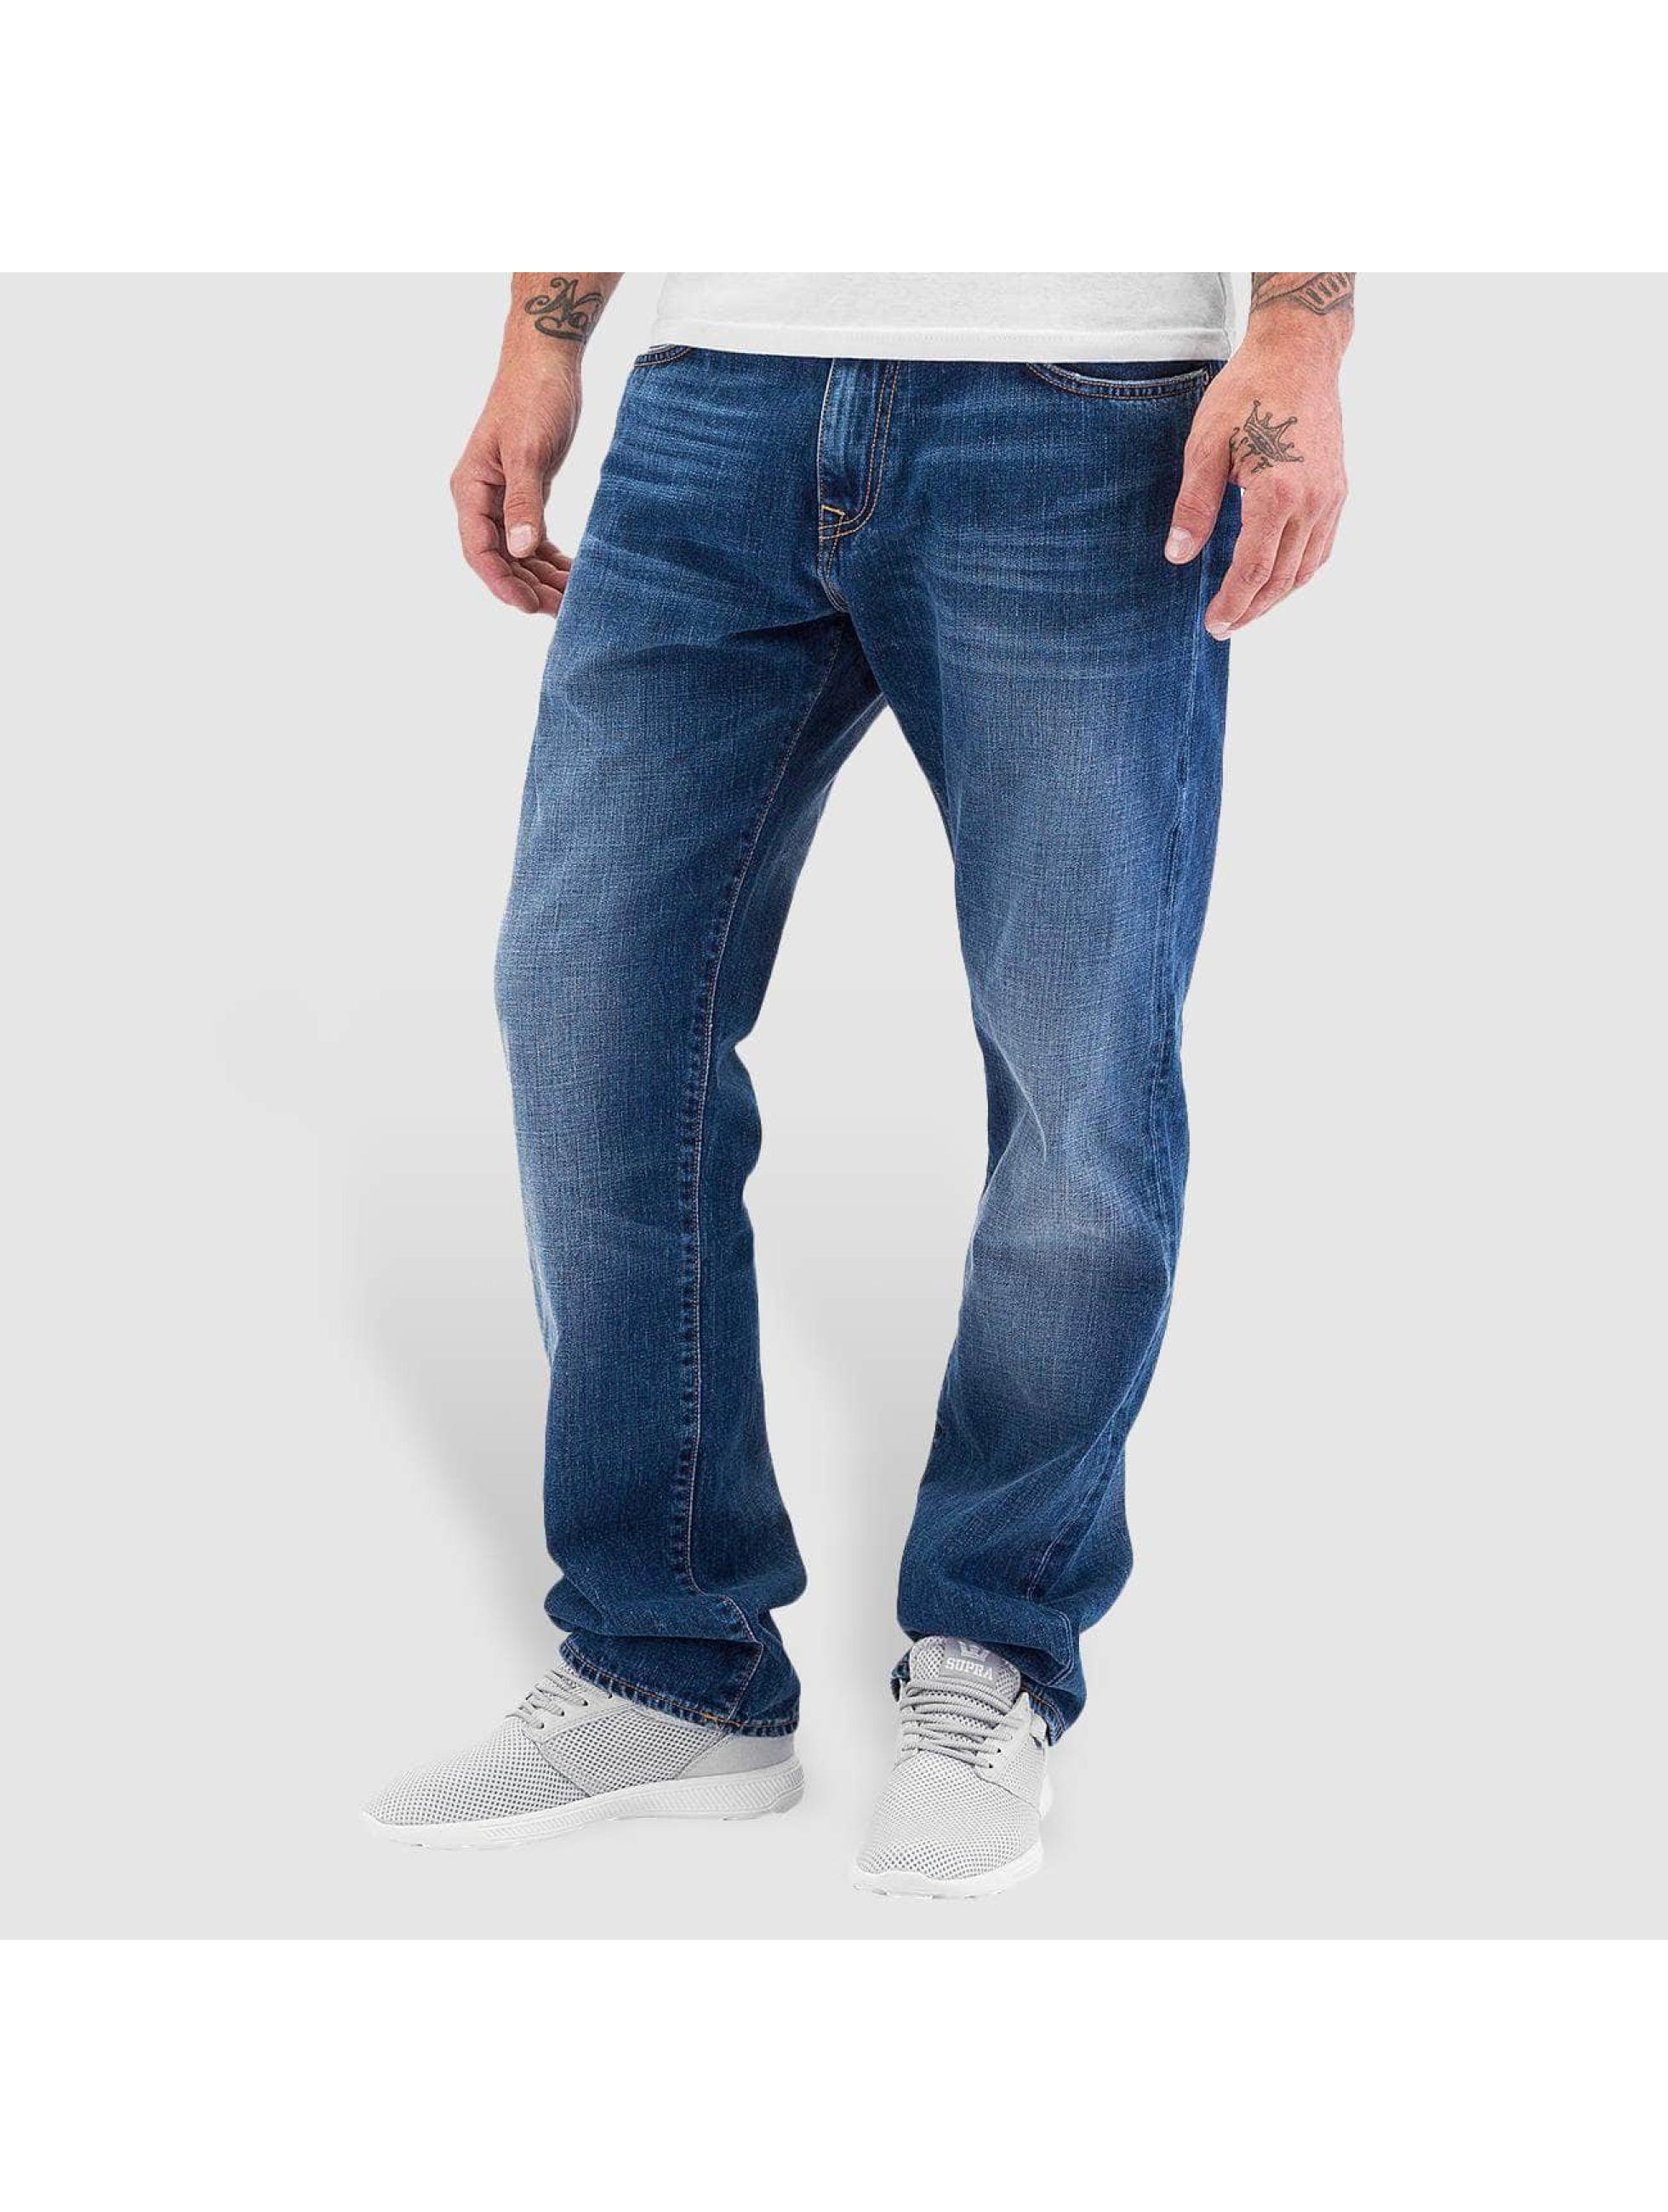 Carhartt WIP Männer Straight Fit Jeans Otero Davies in blau Sale Angebote Hermsdorf